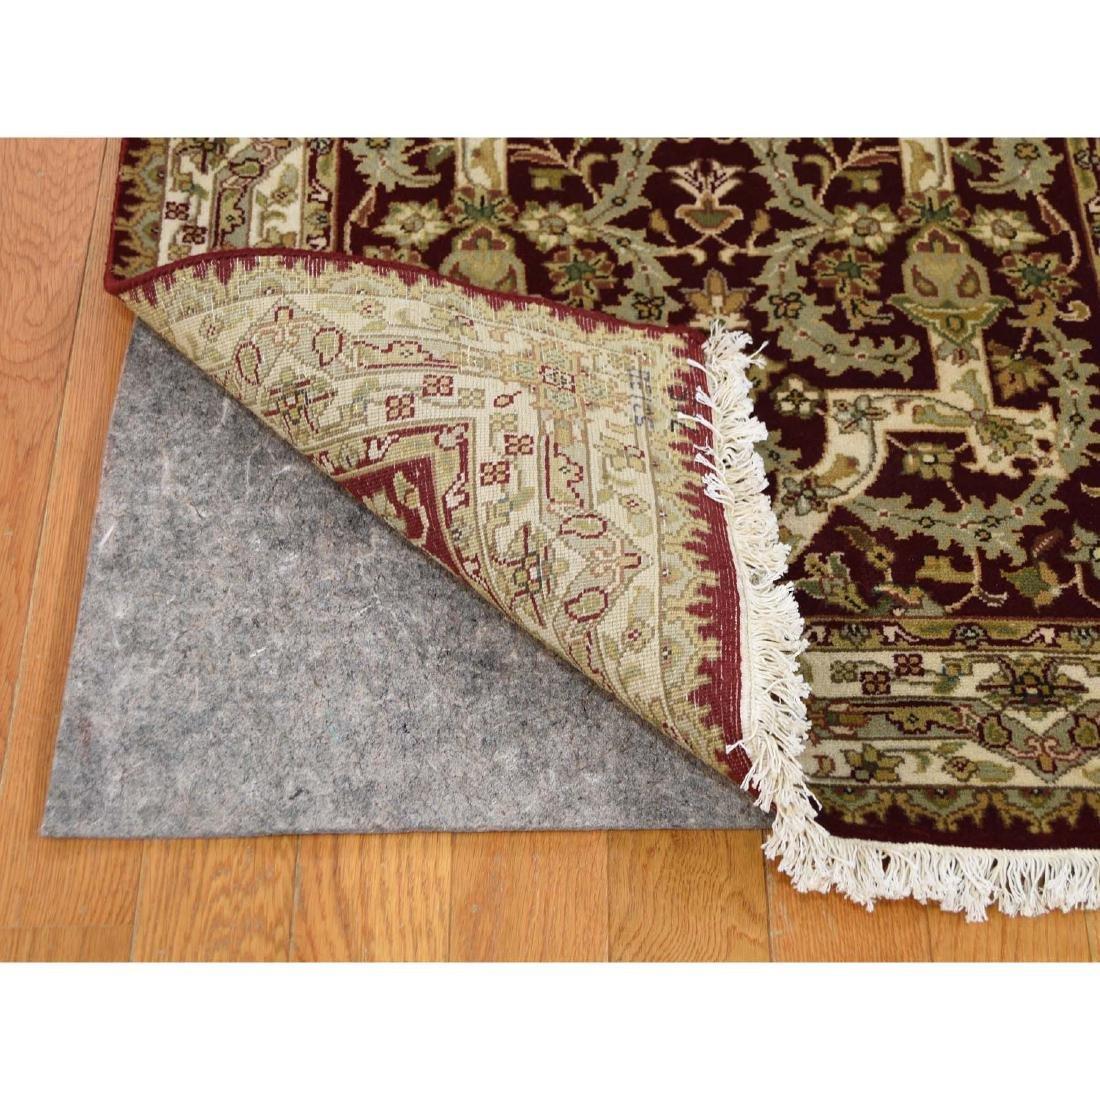 XL Runner Wool and Silk Tabriz Design 300 Kpsi Hand - 5